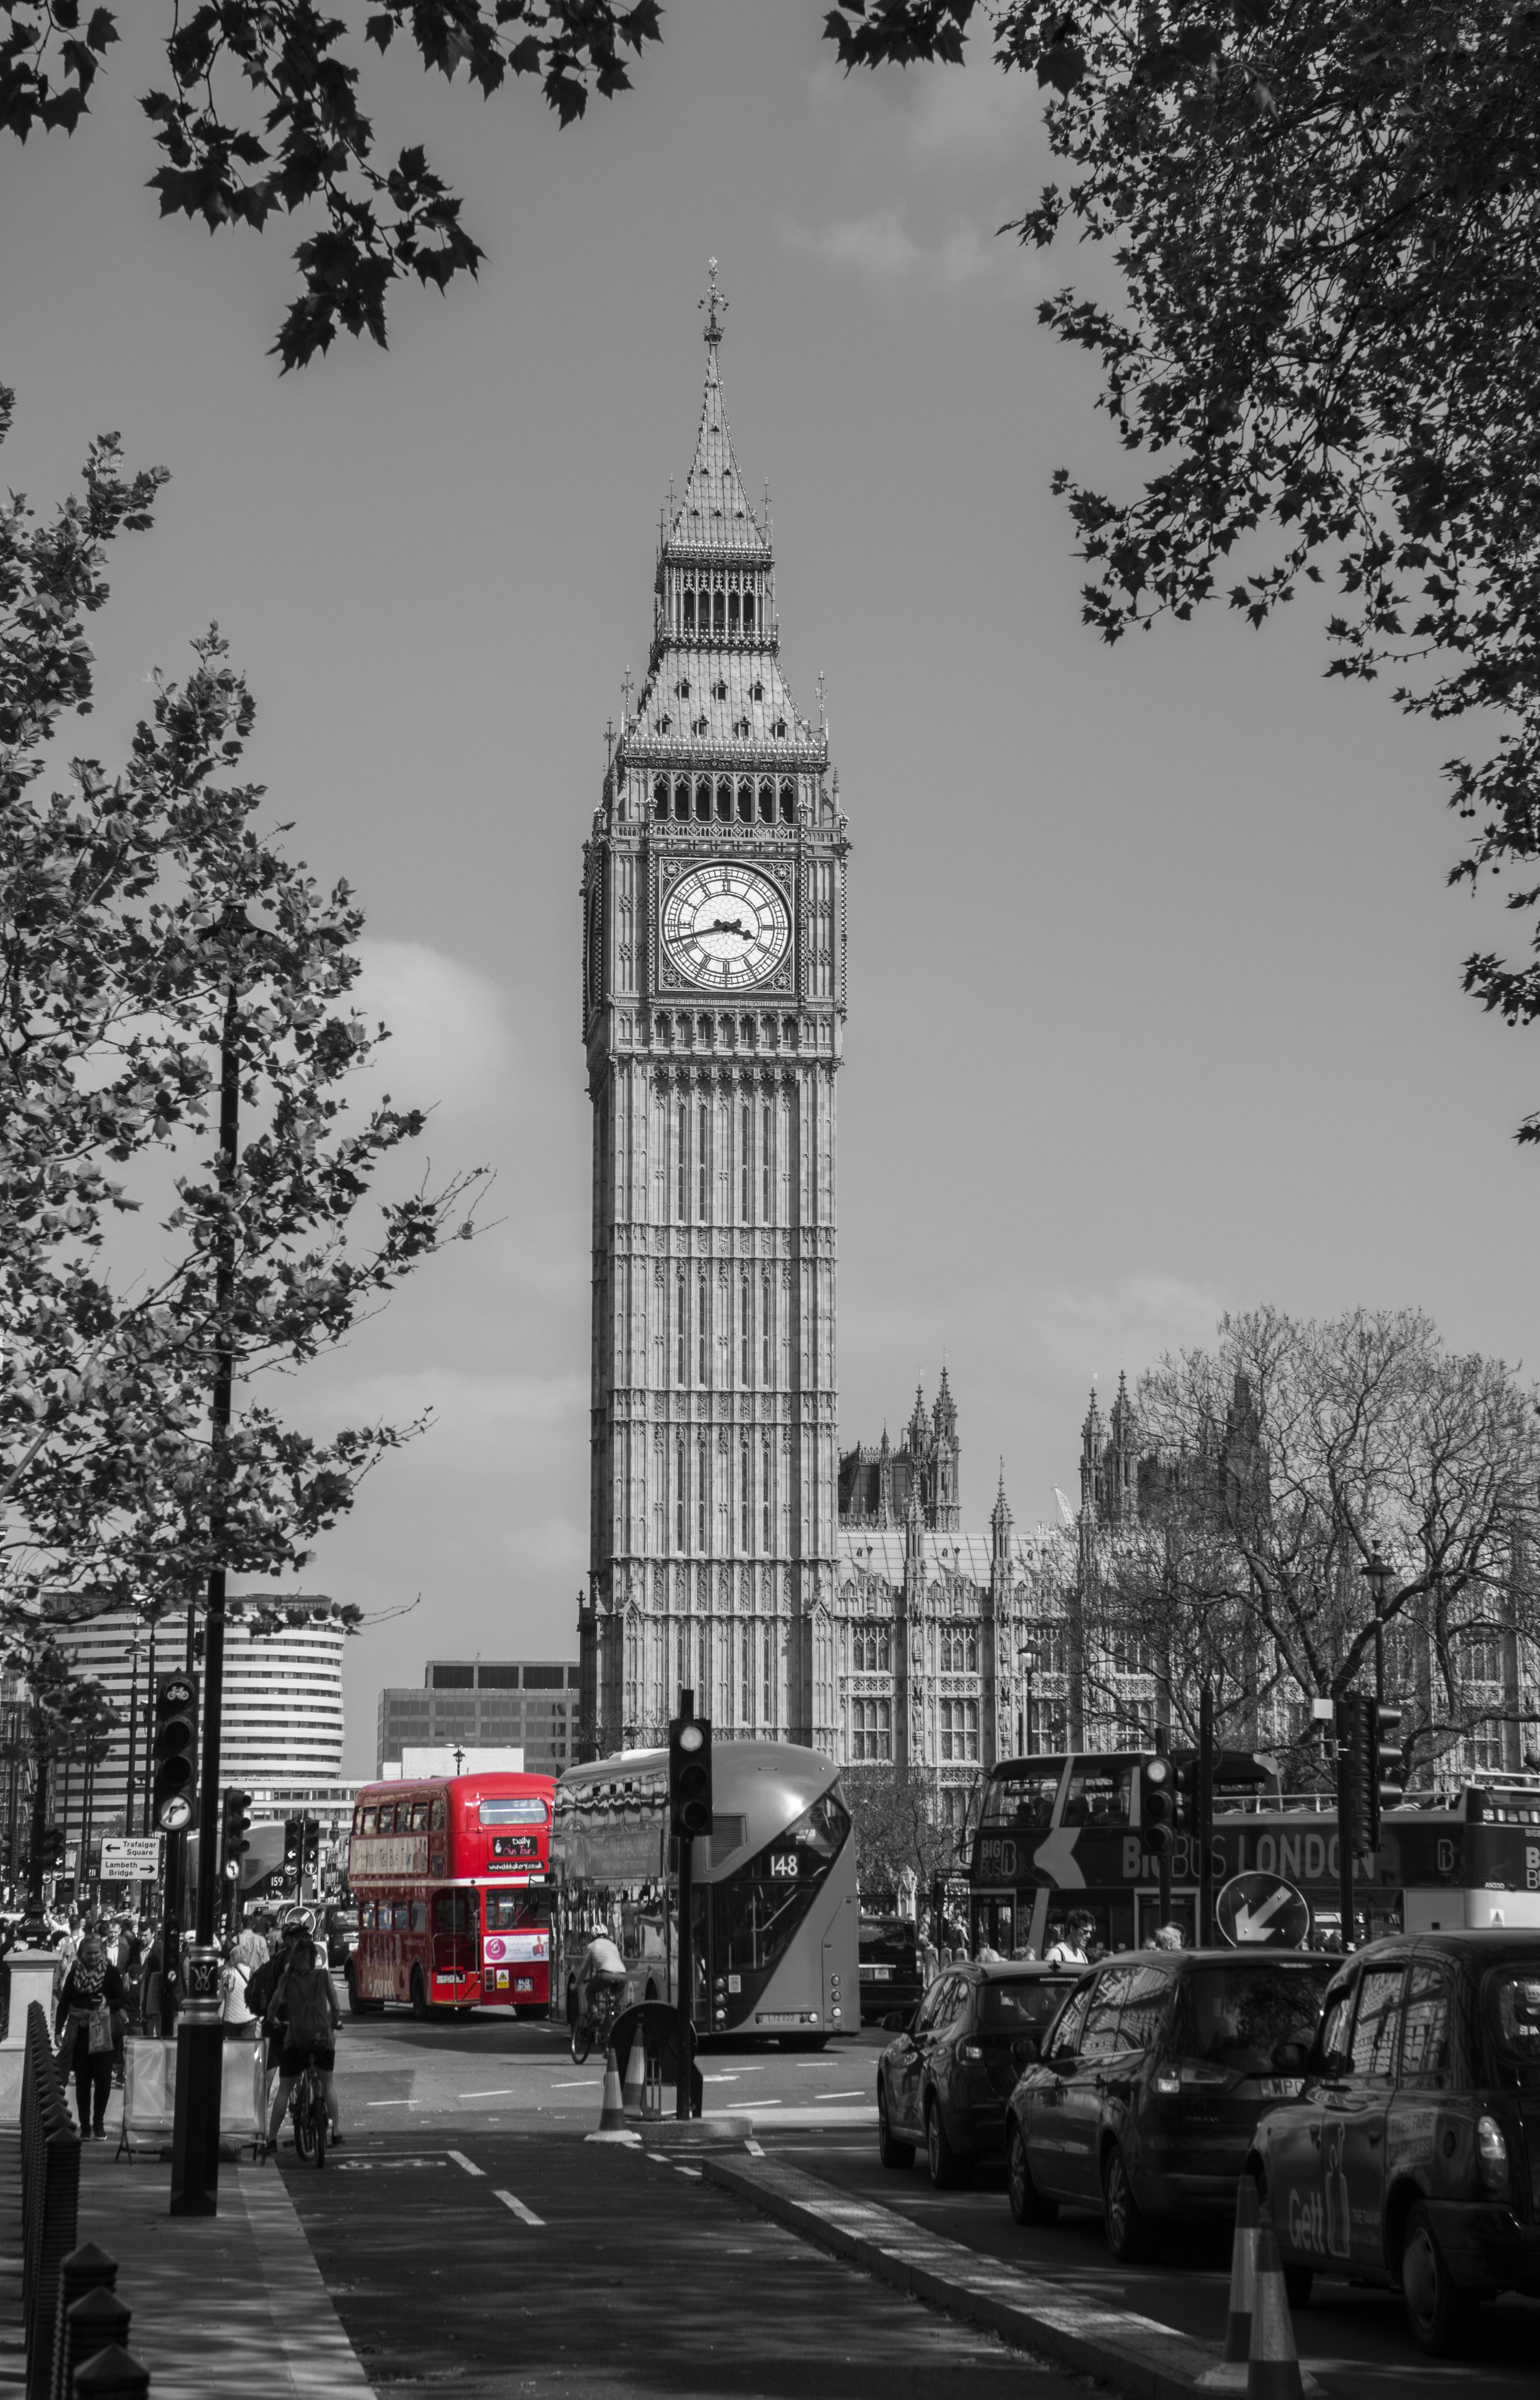 DSC_6316_Big Ben sv med röd buss